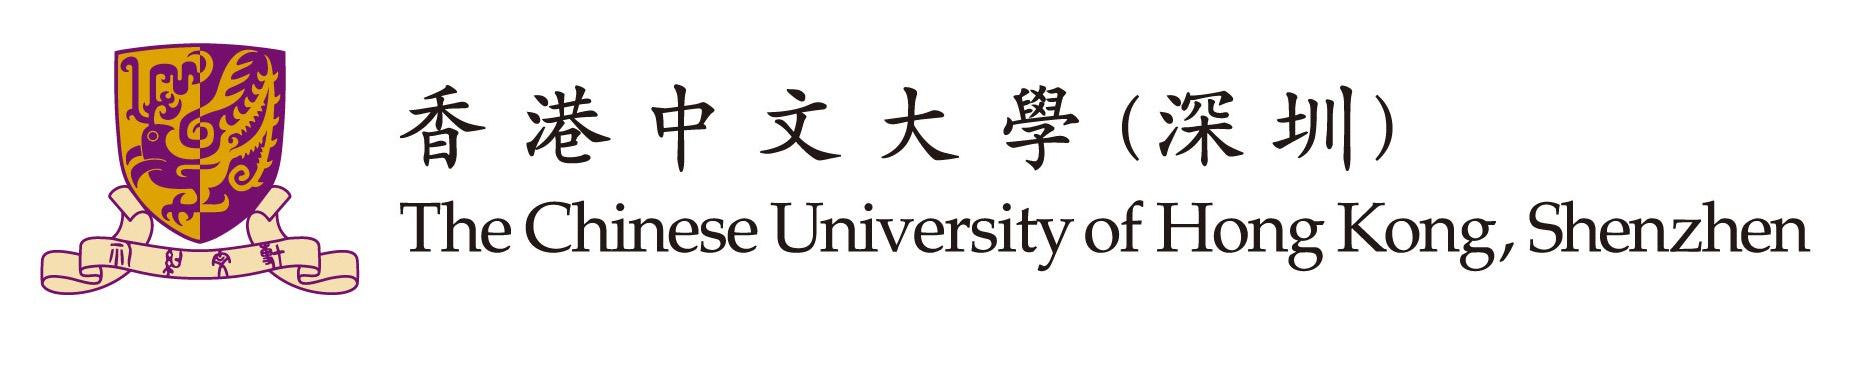 The Chinese University of Hong Kong, Shenzhen